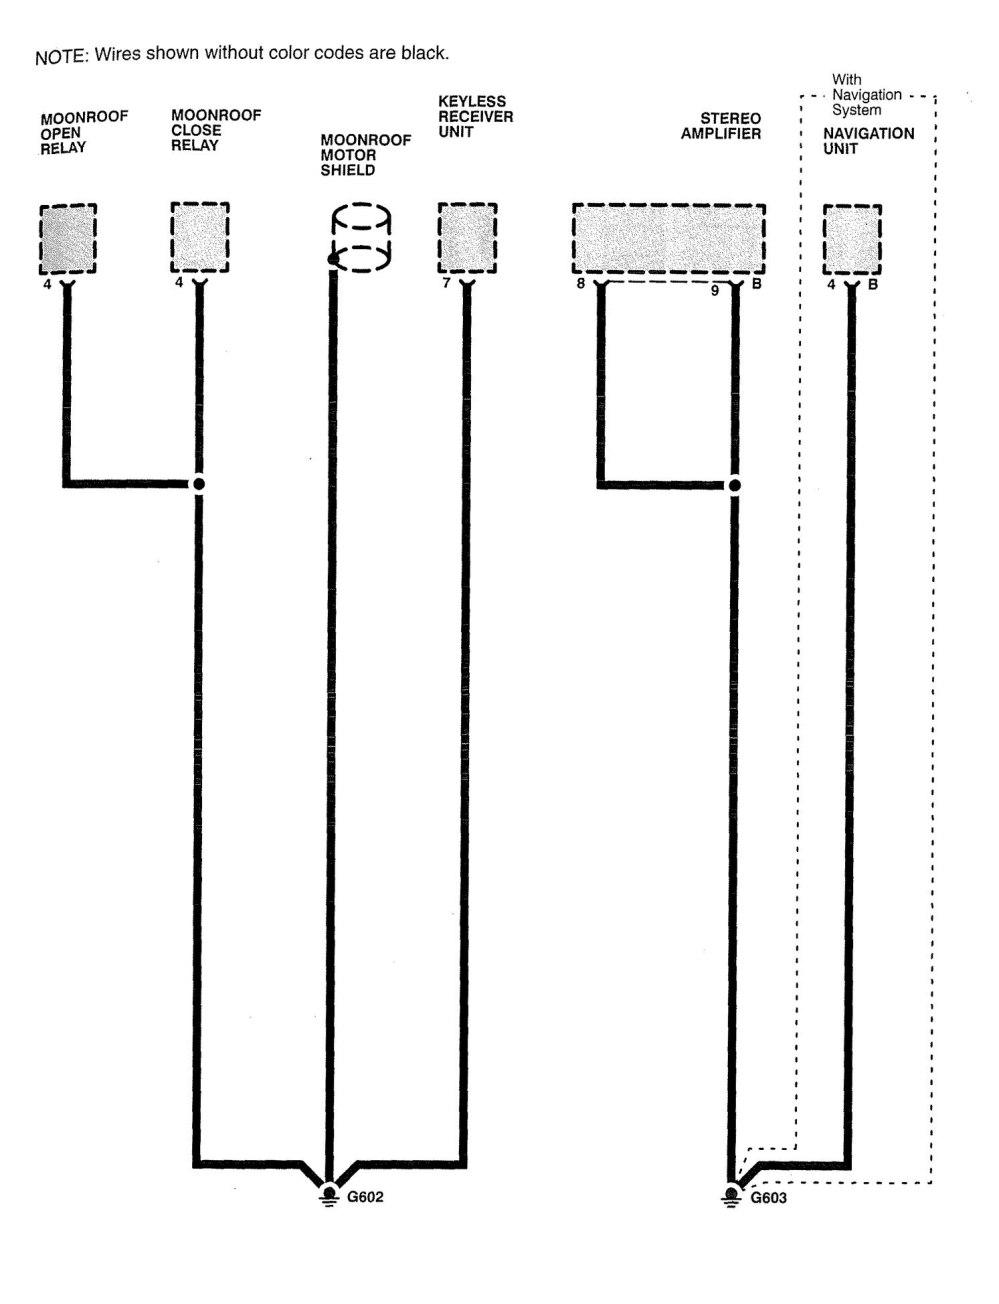 medium resolution of acura rl wiring diagram ground distribution part 9